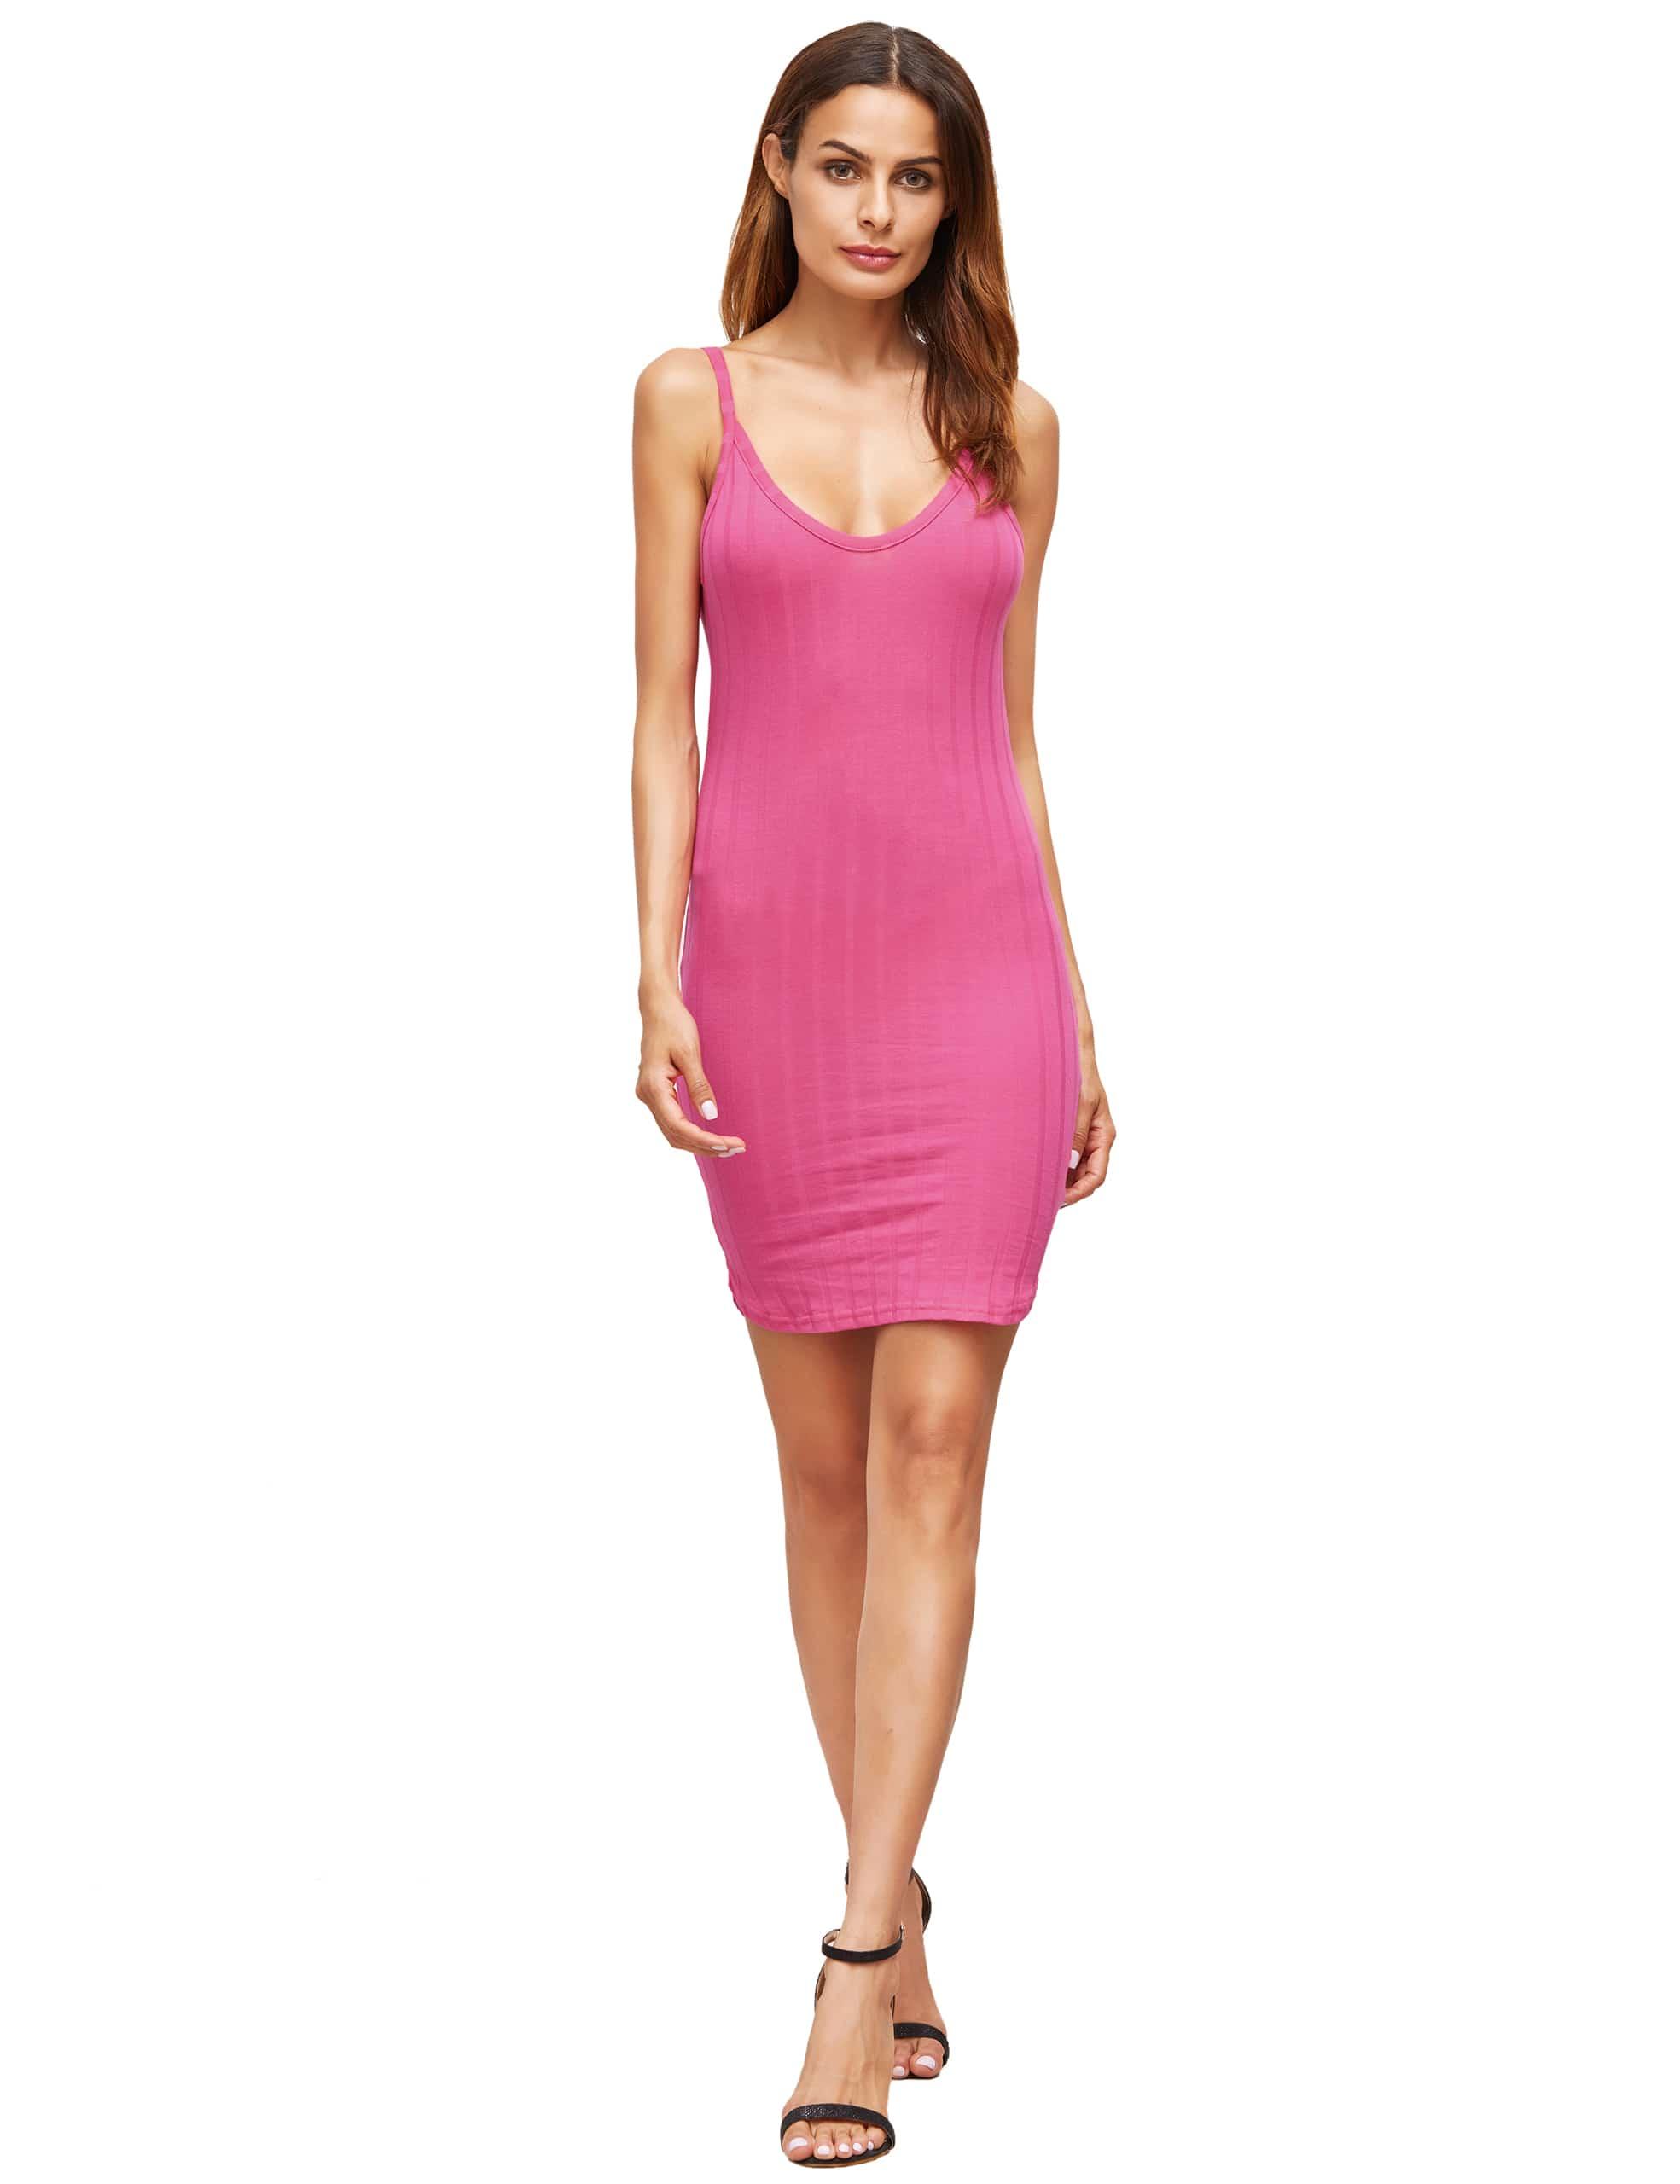 Hot Pink Spaghetti Strap Bodycon DressHot Pink Spaghetti Strap Bodycon Dress<br><br>color: None<br>size: L,M,S,XL,XS,XXL